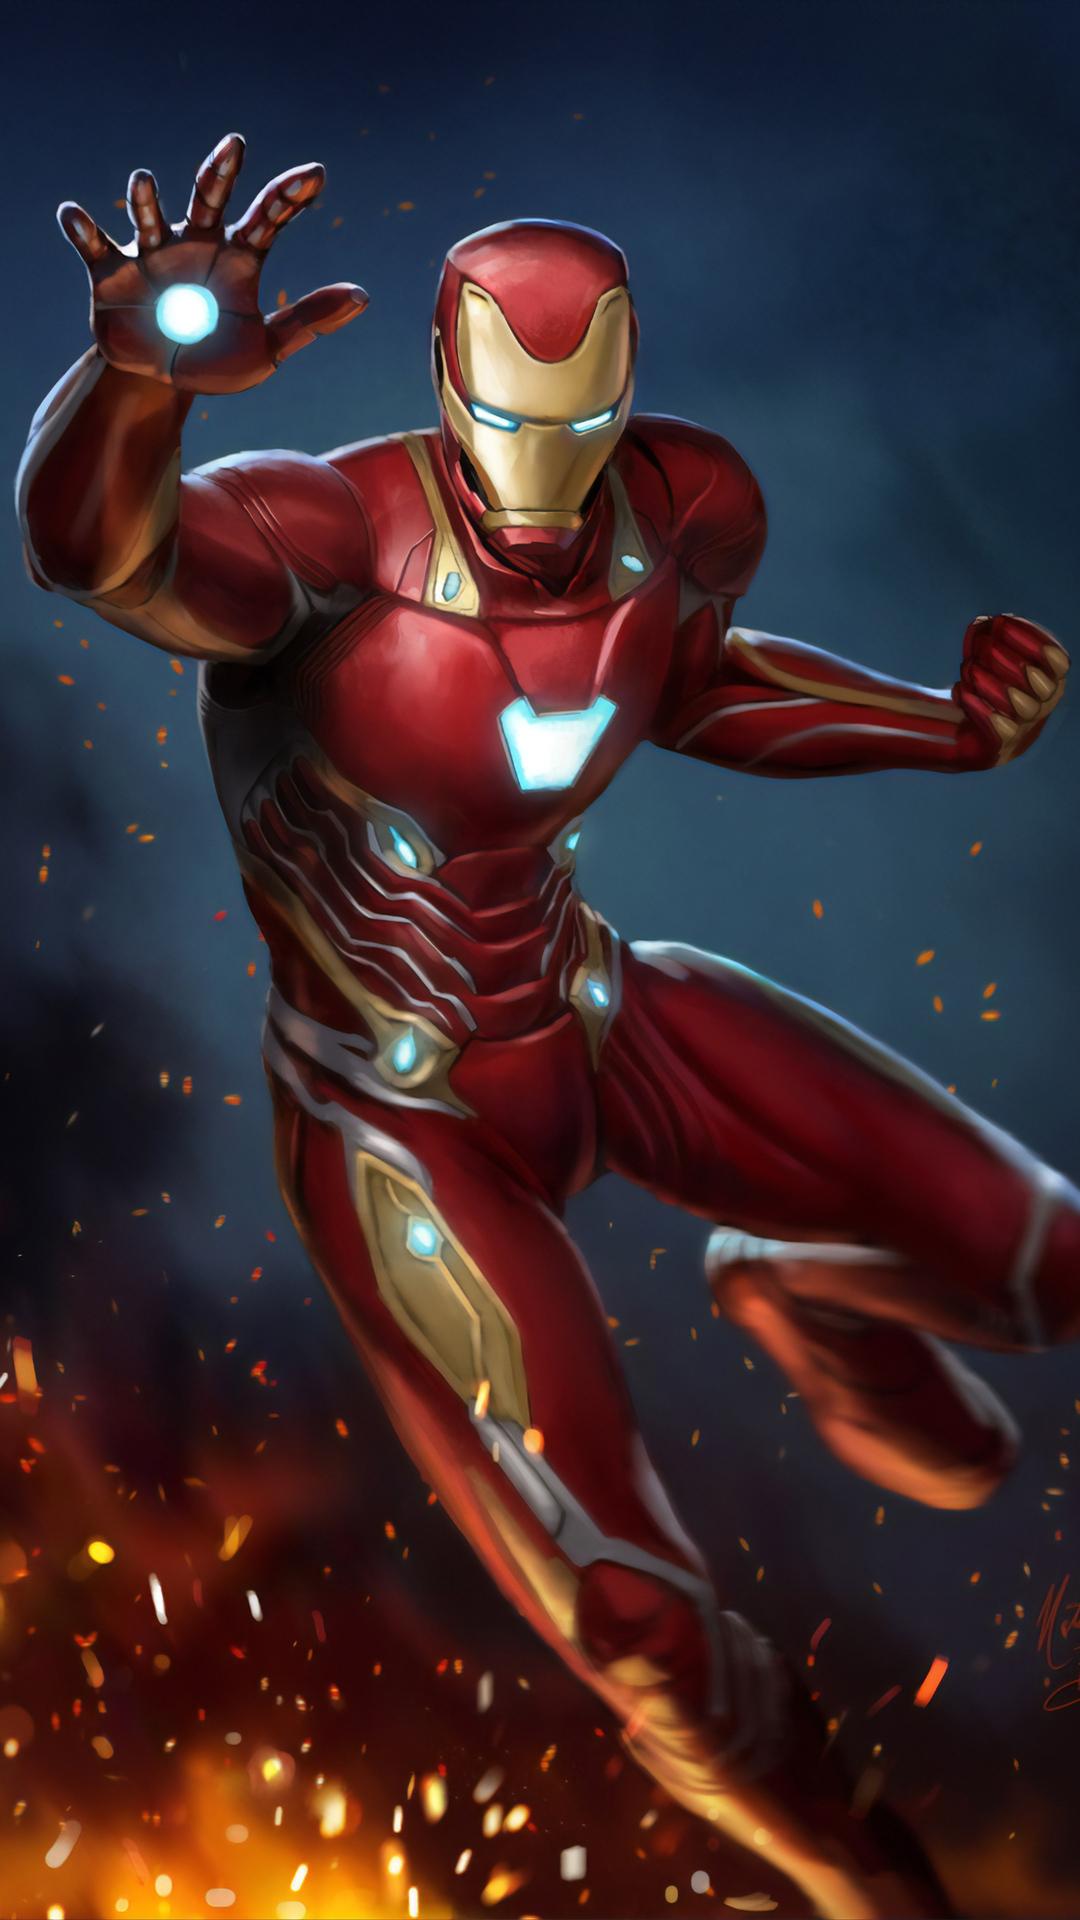 1080x1920 Art Iron Man 2019 Iphone 7,6s,6 Plus, Pixel xl ...